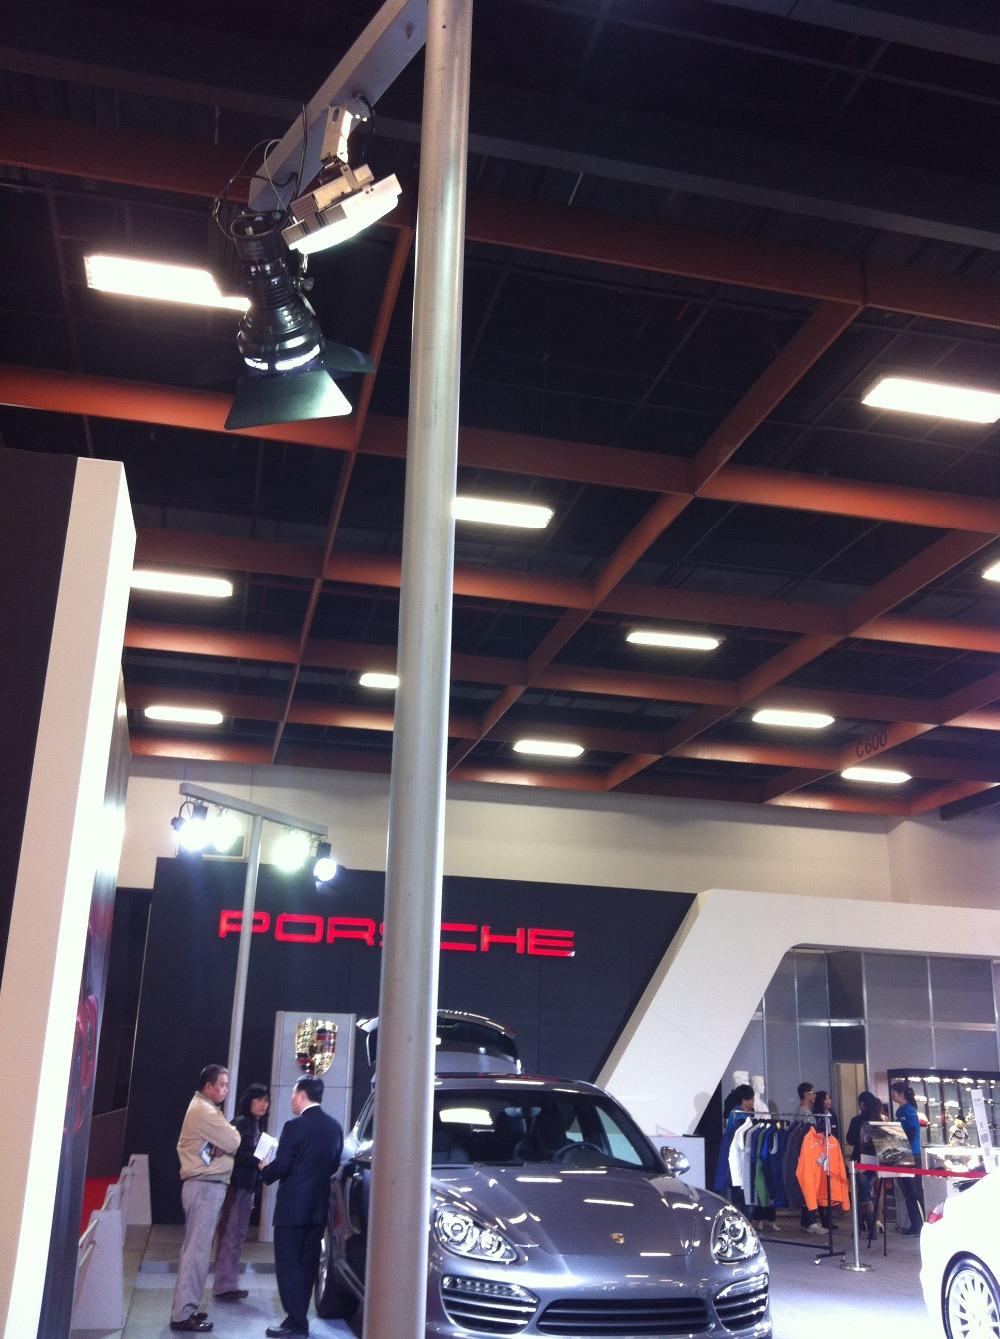 Msr 575 Hot Re-stike Auto Show Light